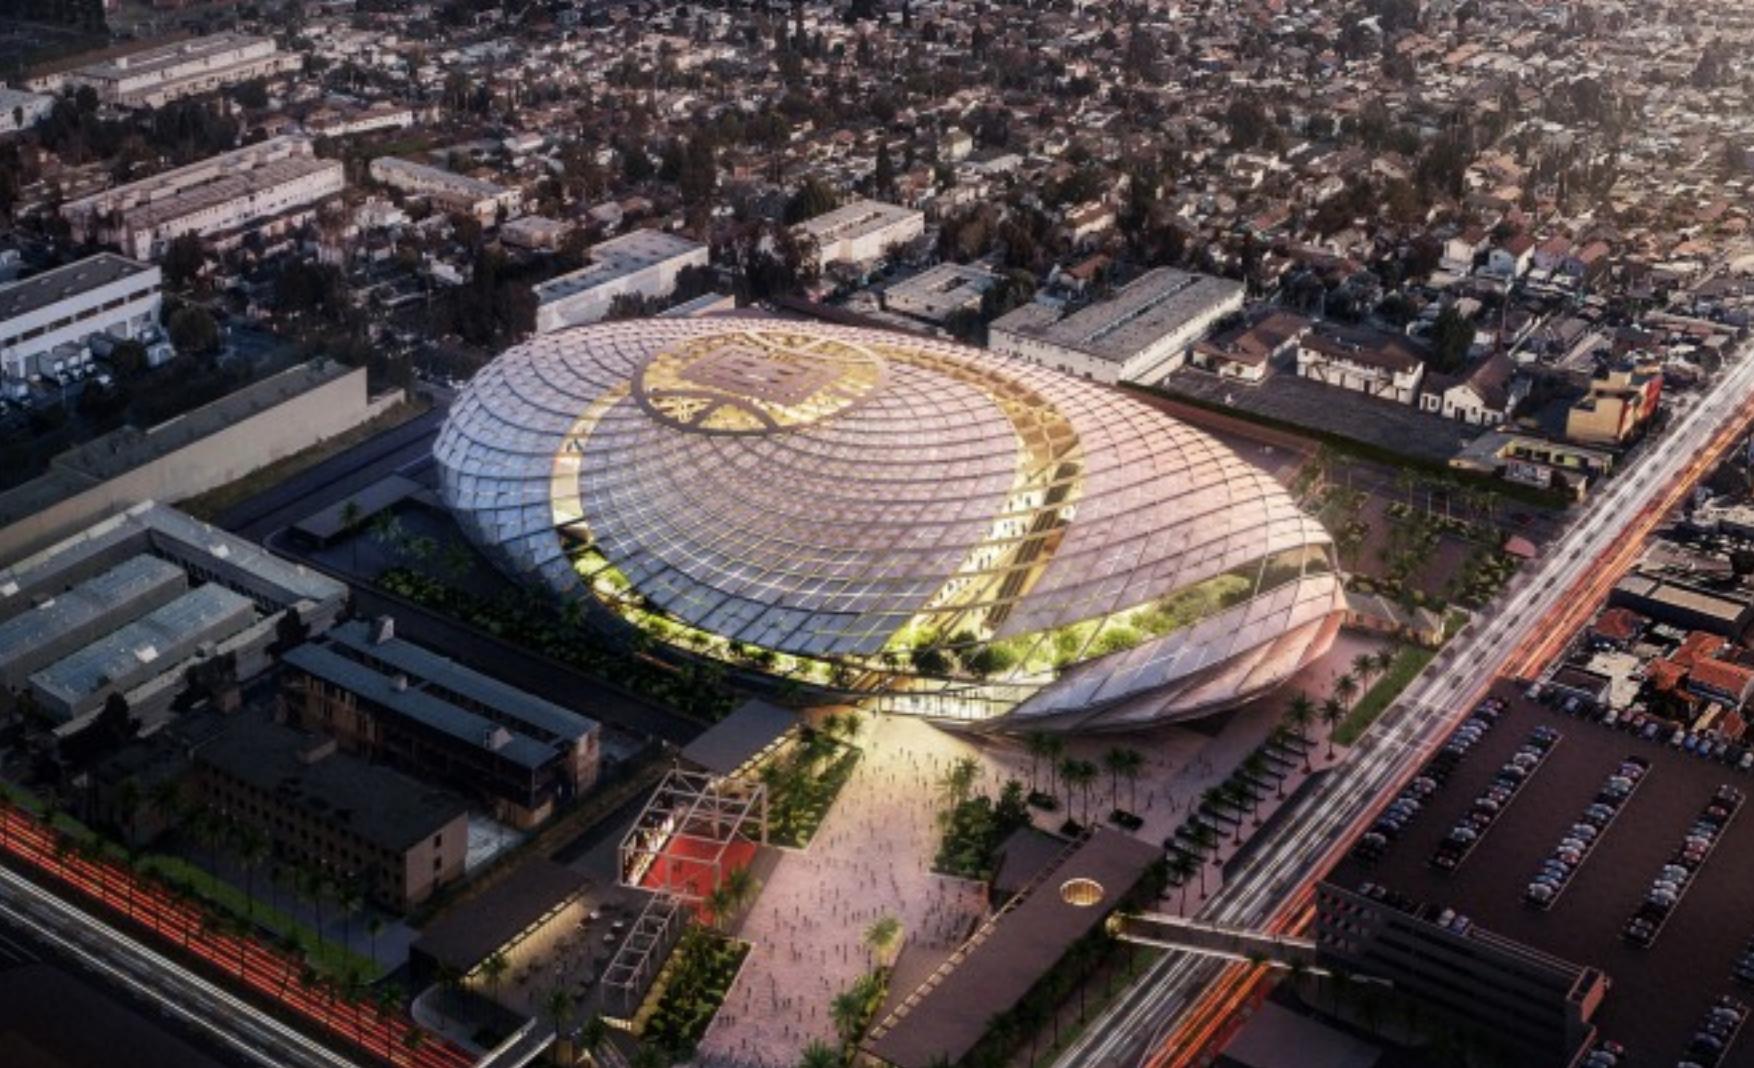 Basketball Stadium Overhead Shot with City Around It